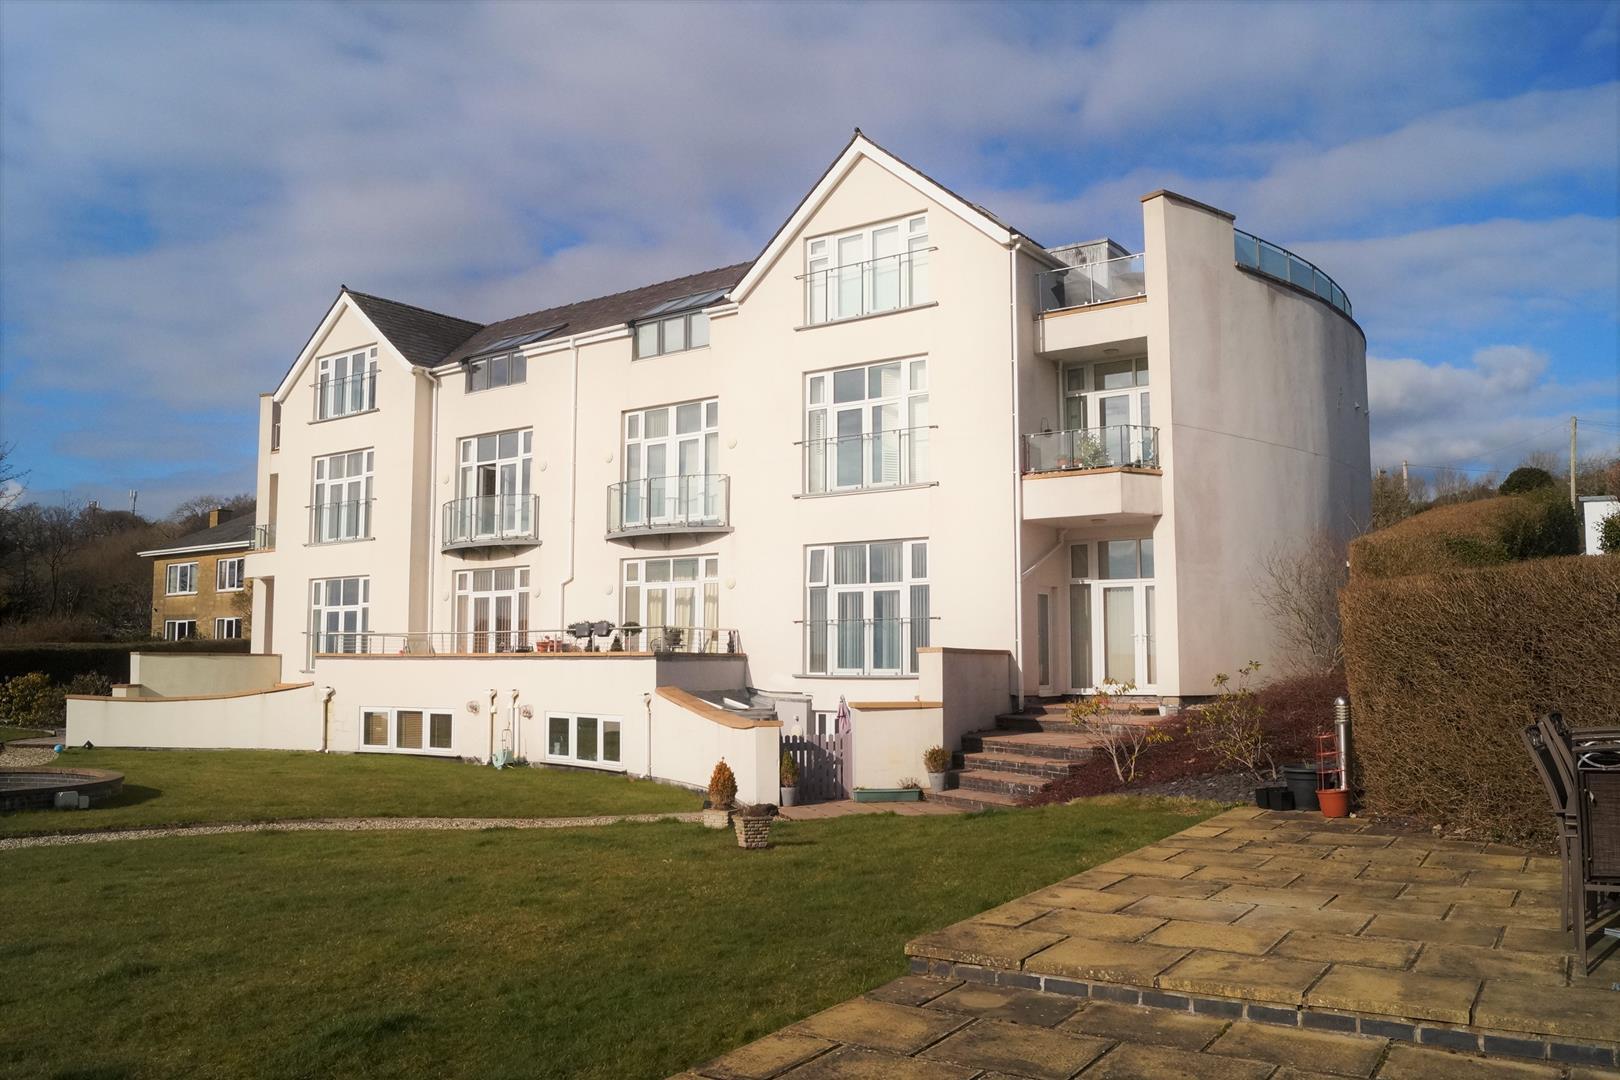 Caernarfon Road, Pwllheli - £229,000